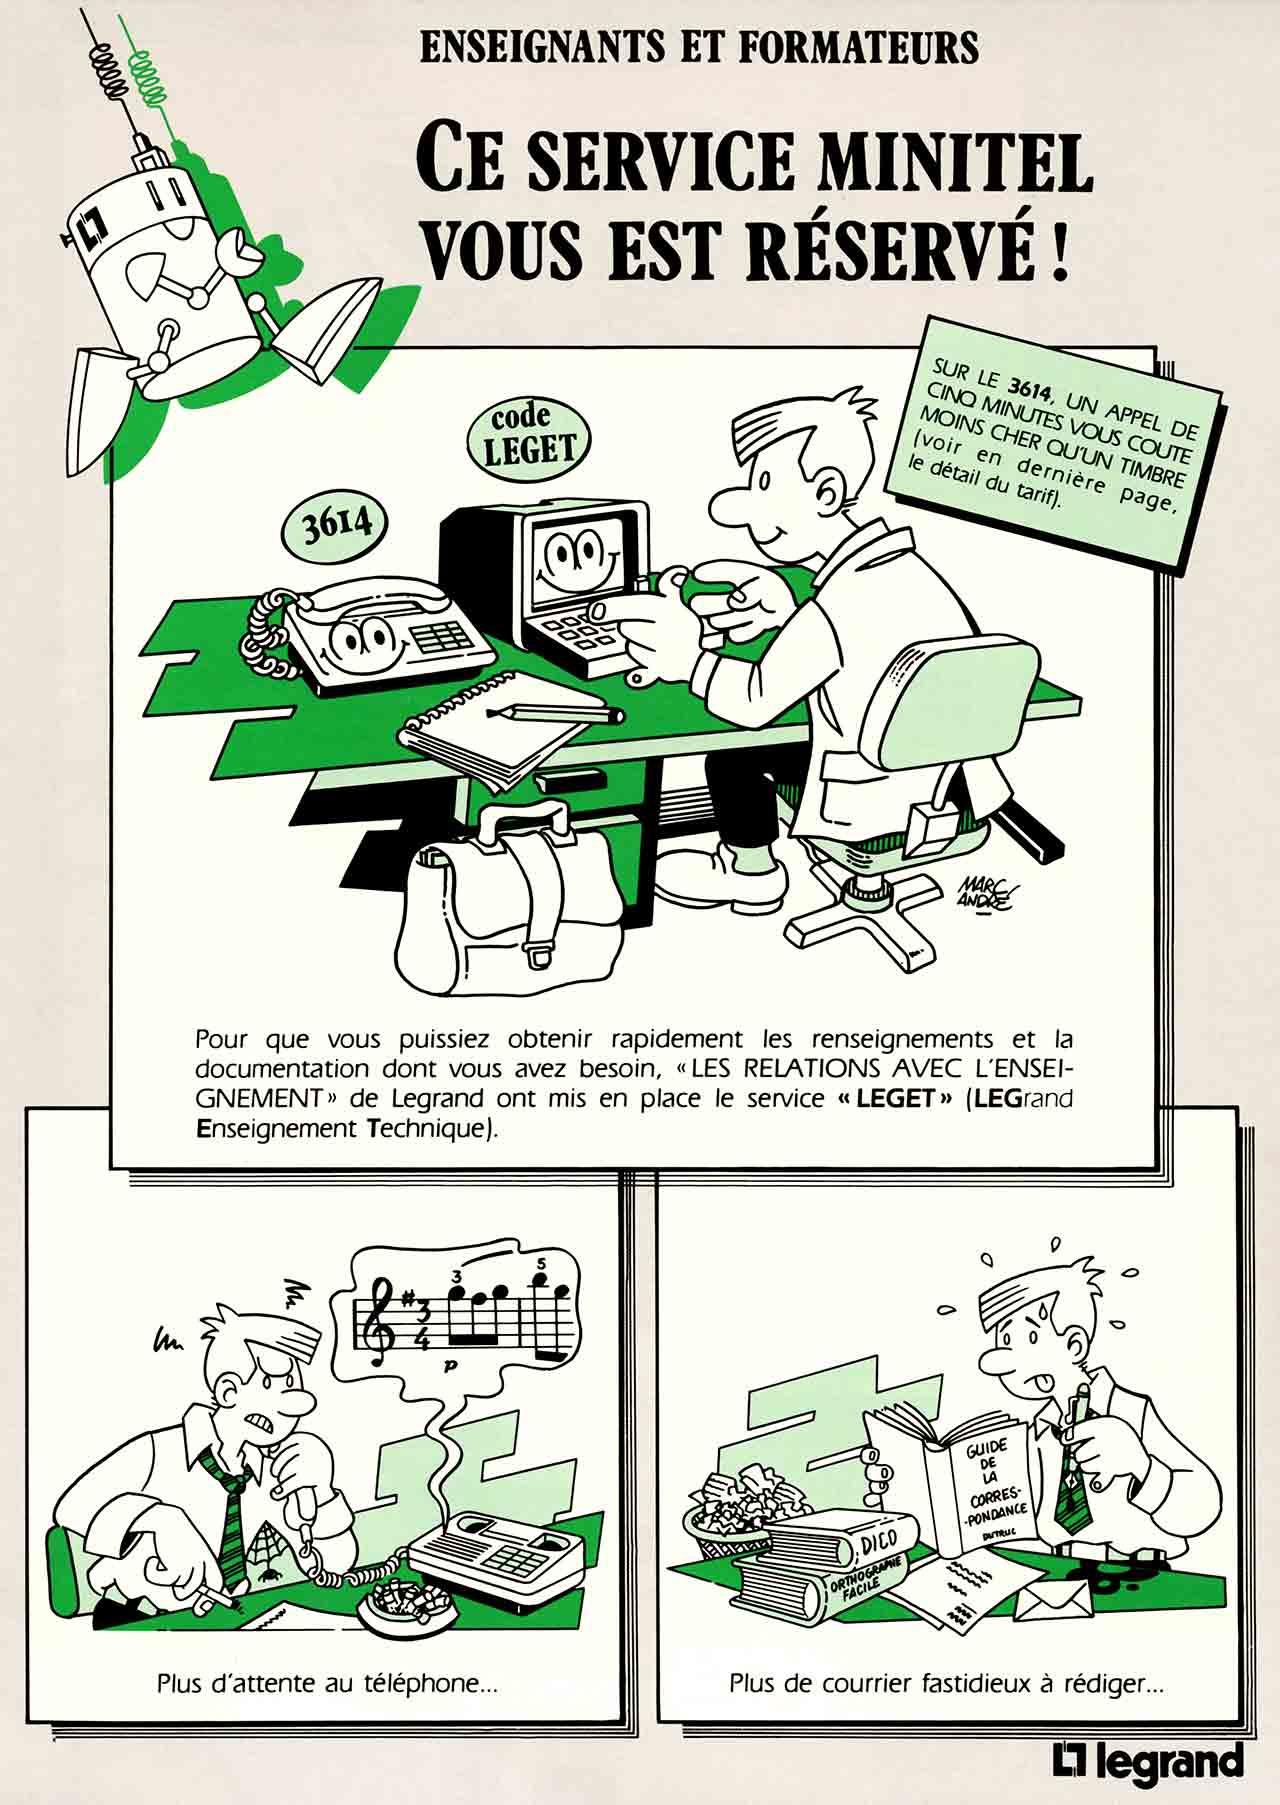 1988-Service-Minitel-Leget-Legrand-Enseignement-Technique